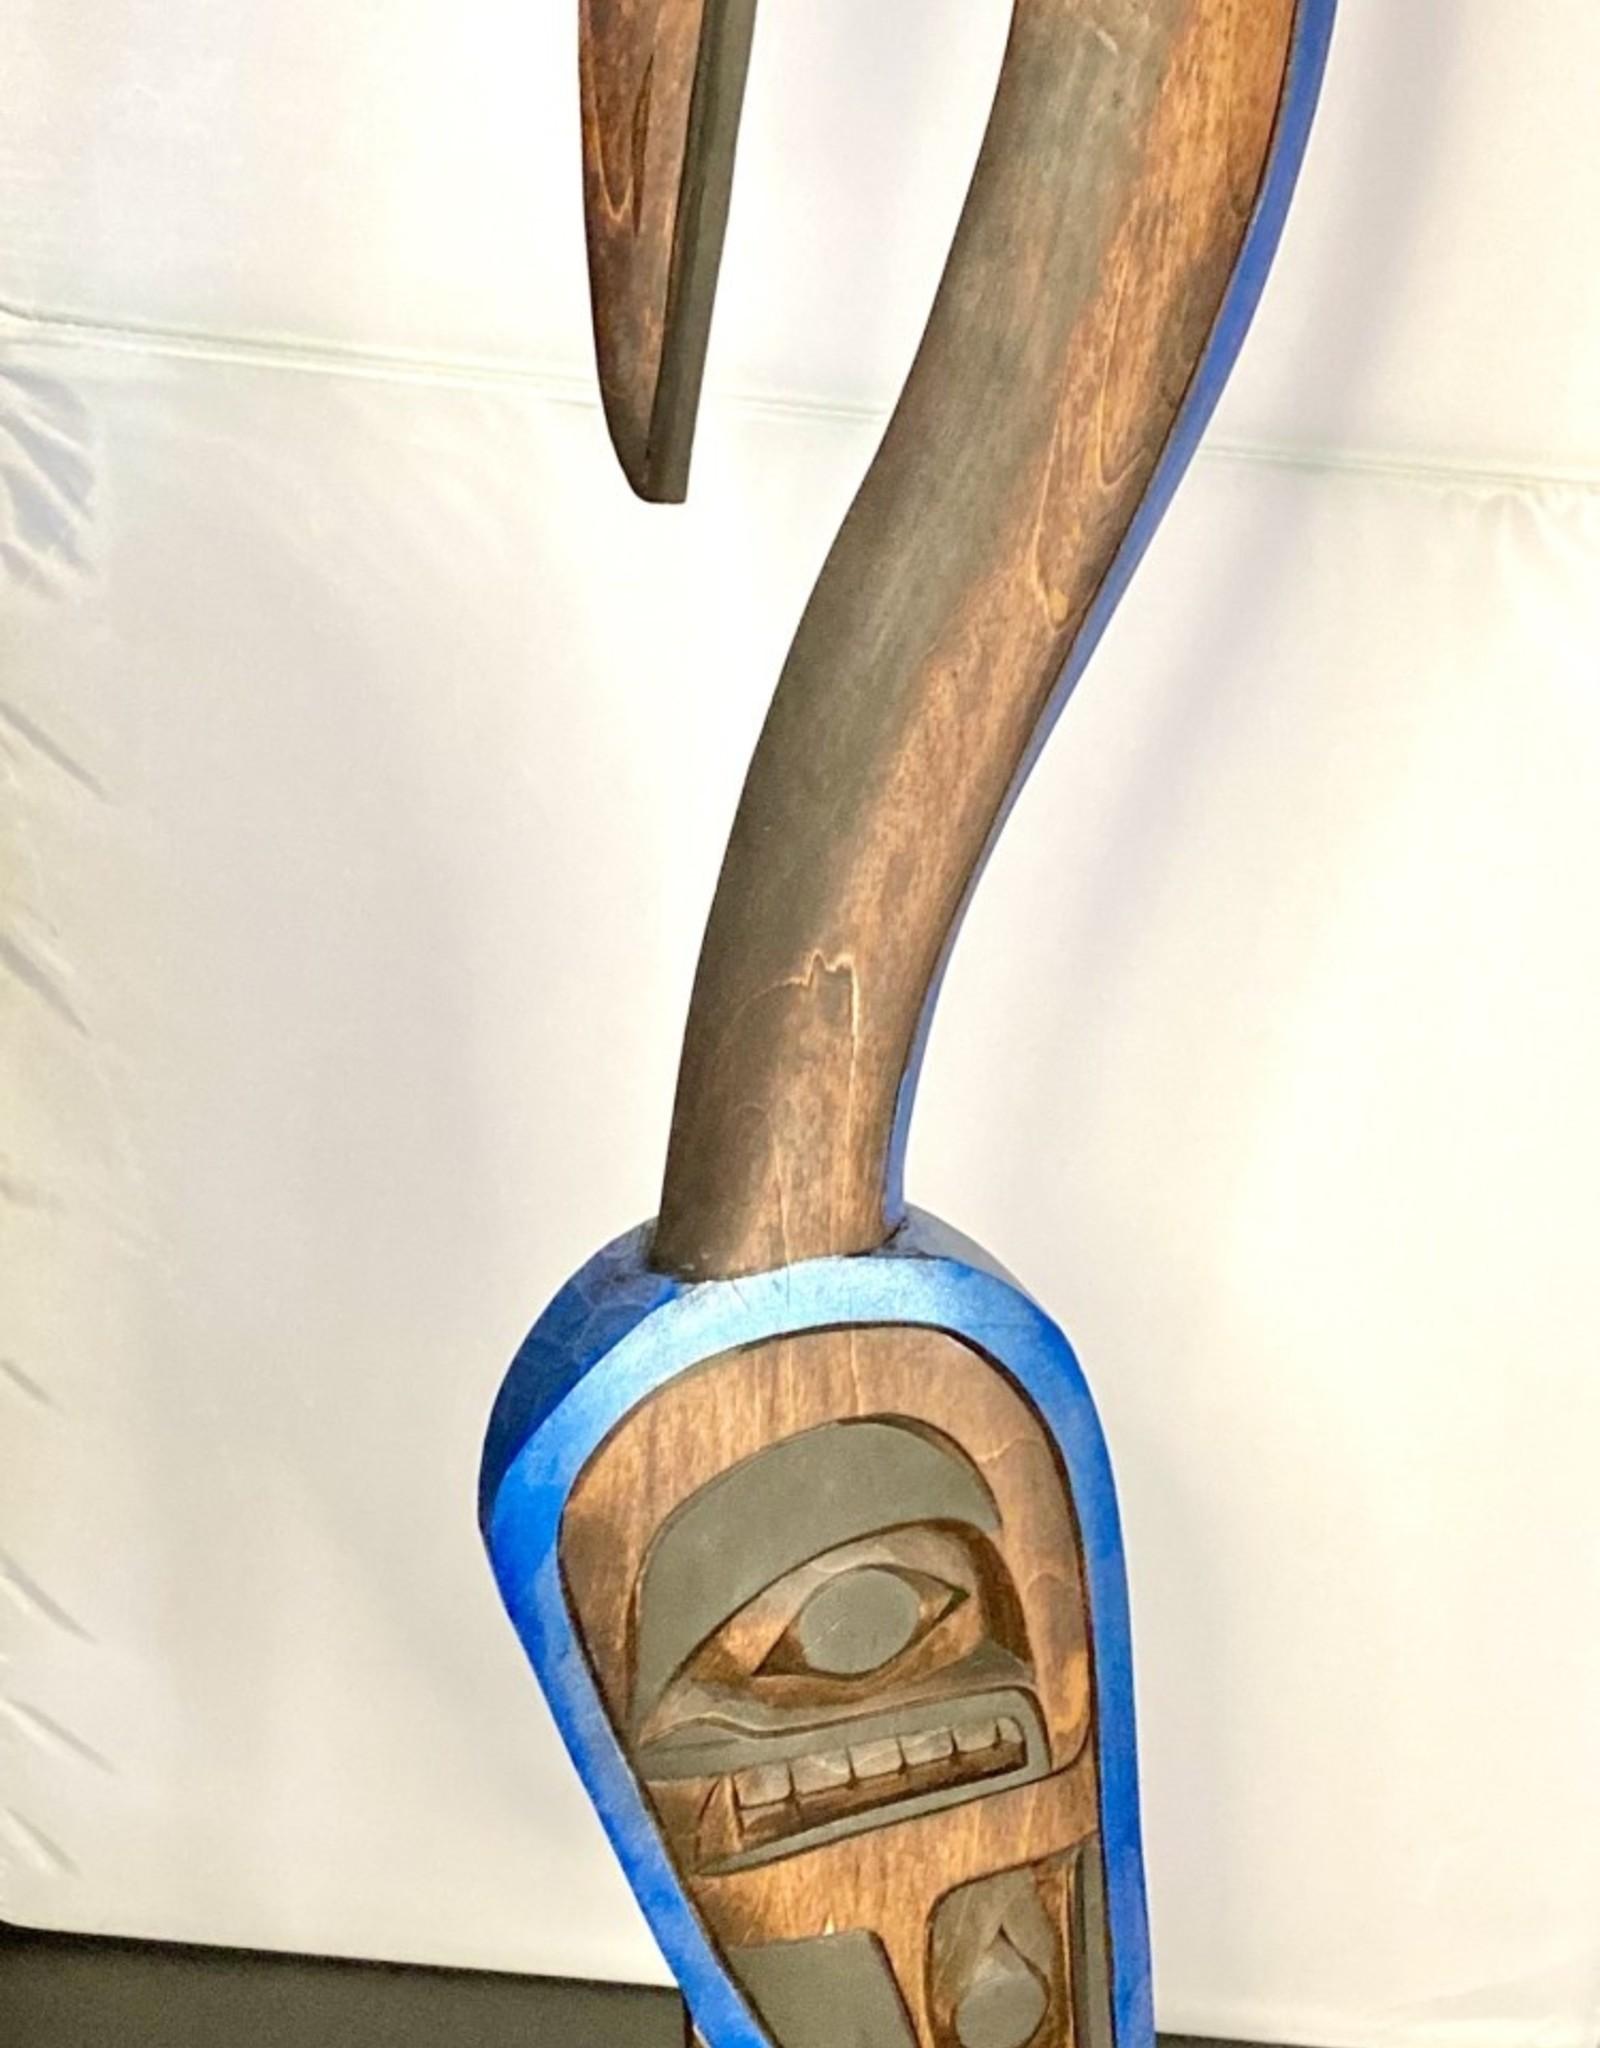 Aboriginal - Native Carving of a Crane on a Salmon